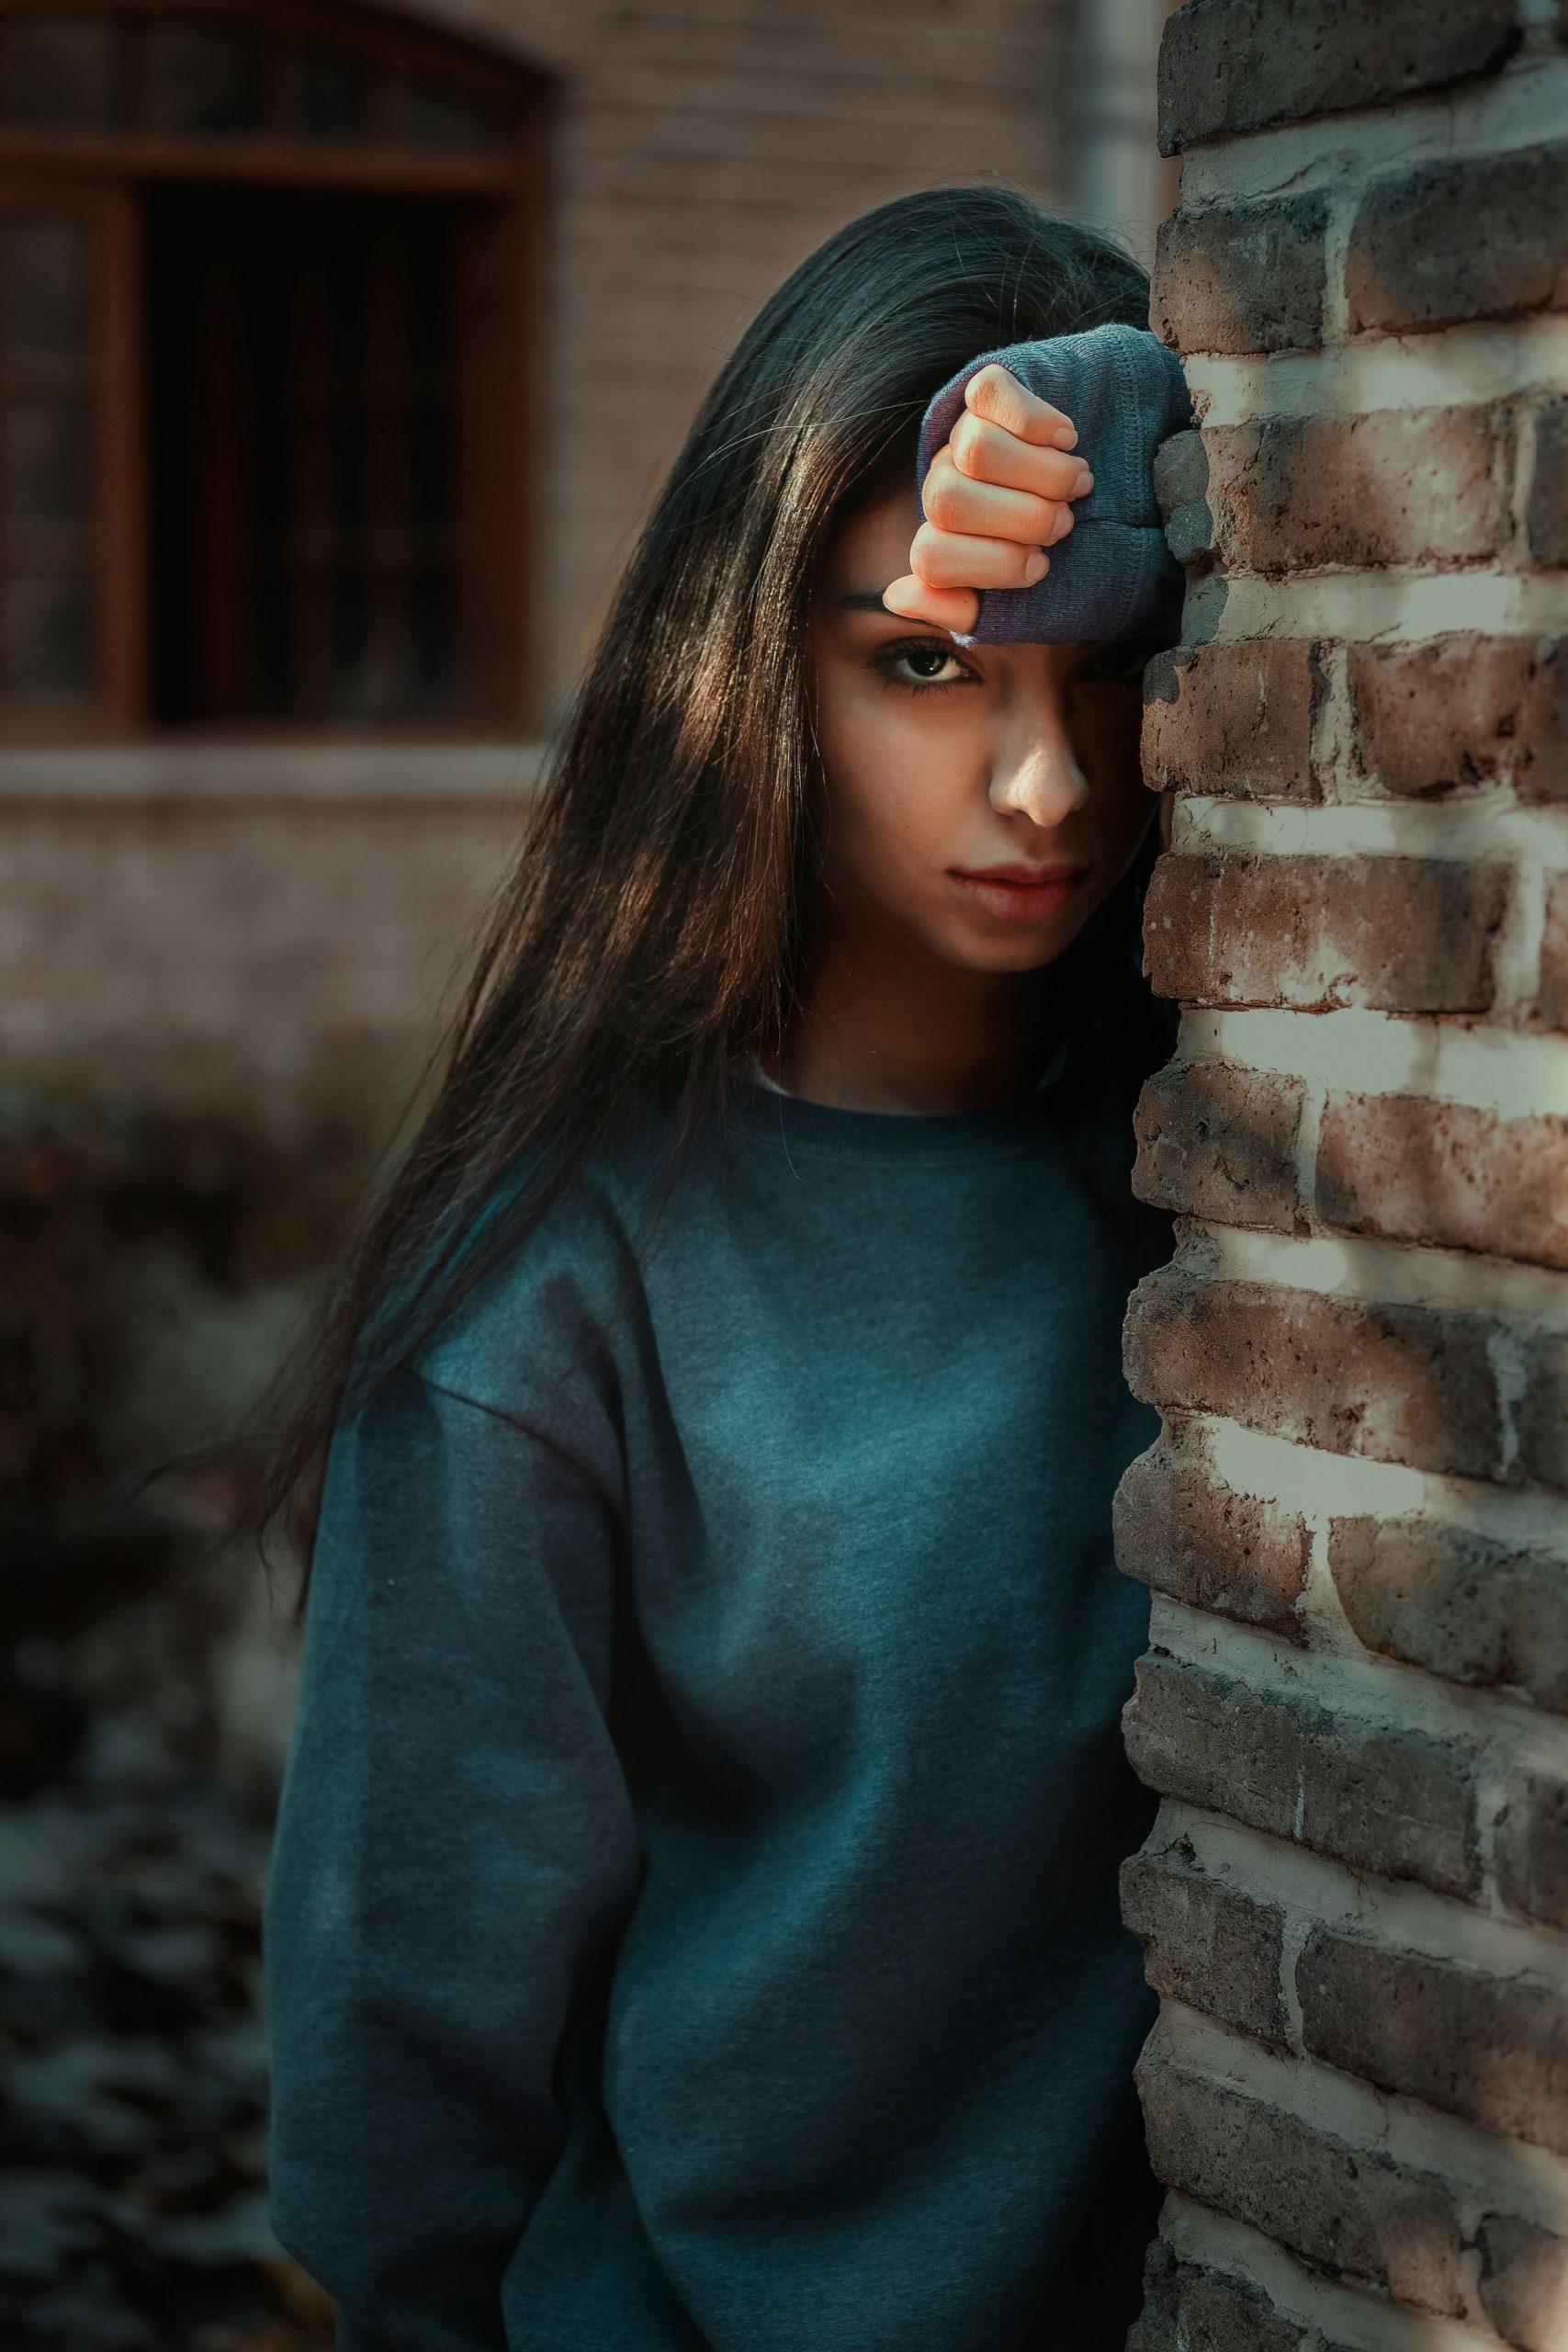 girl New sad face whatsapp dp images photo free hd